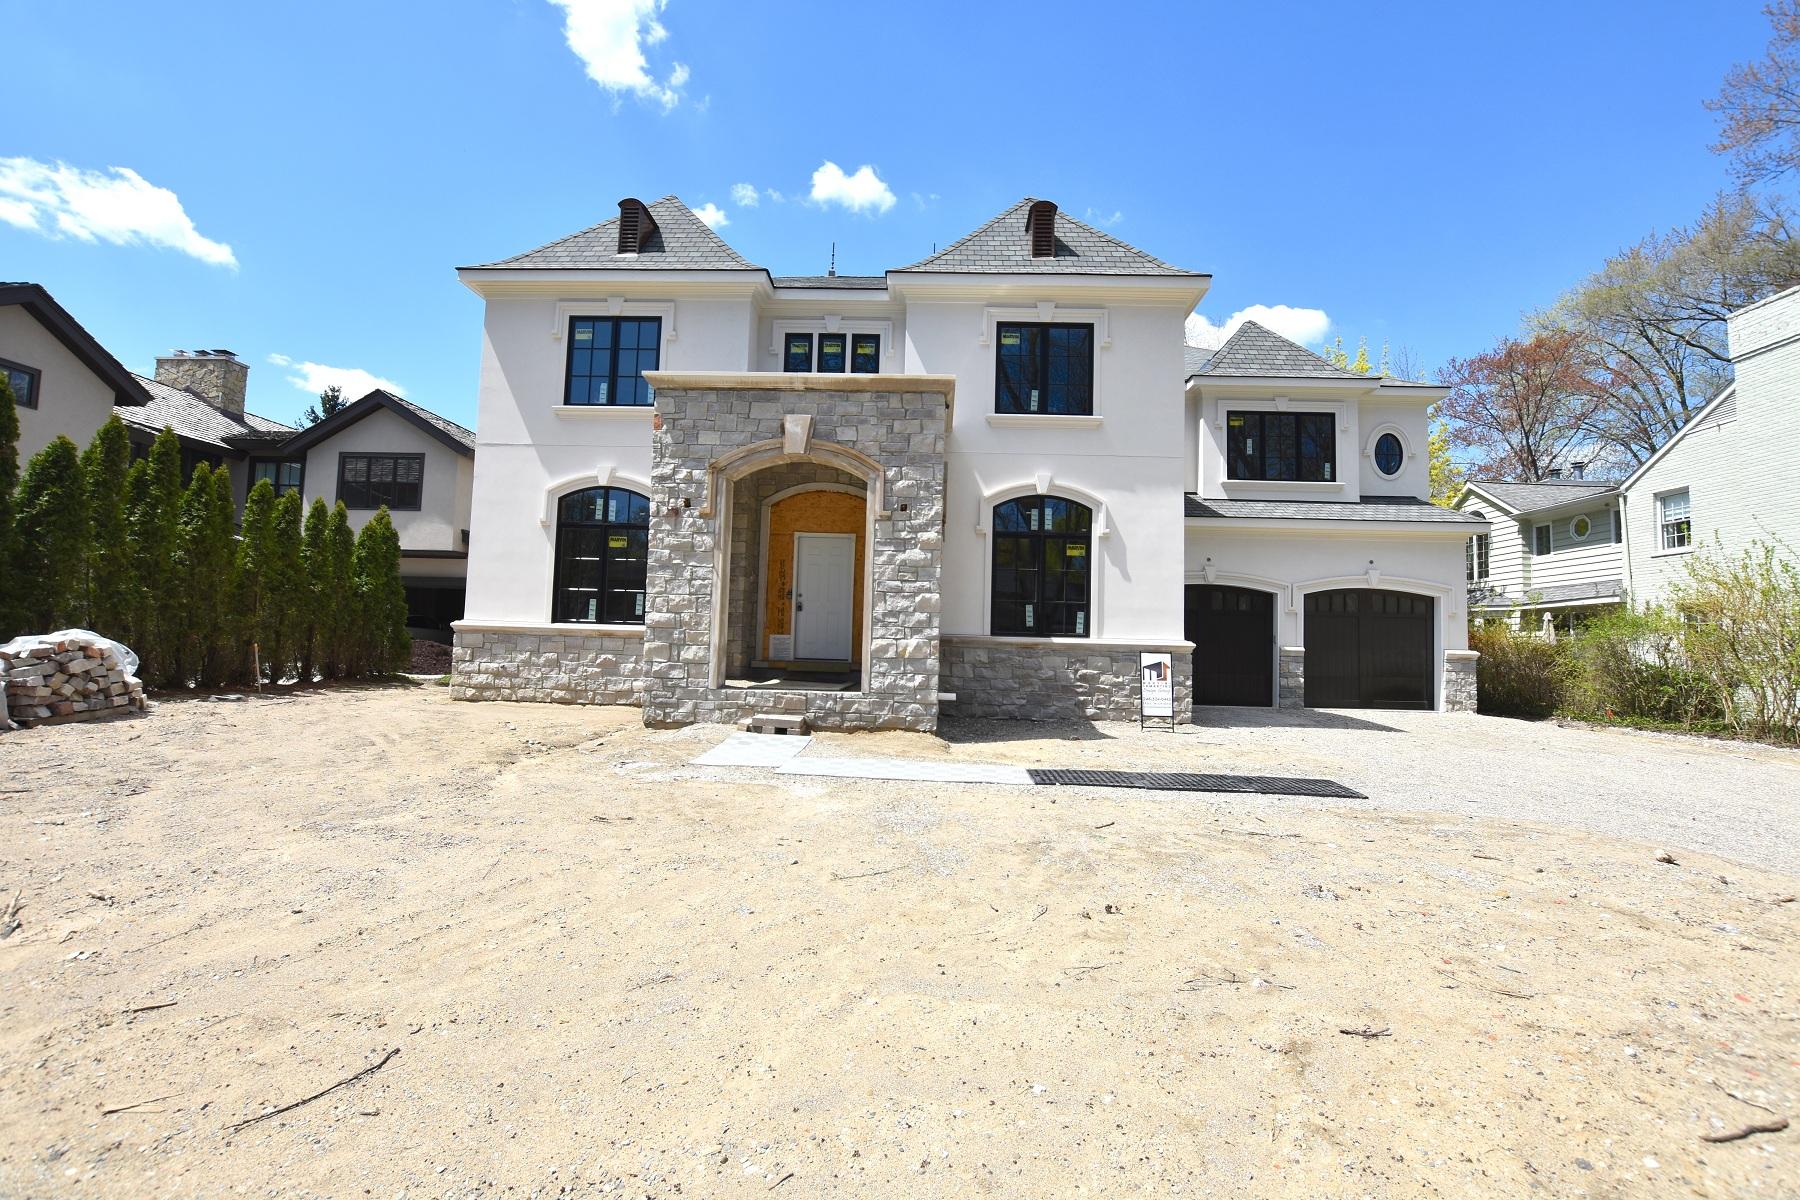 Single Family Homes for Sale at Birmingham 271 Fairfax Street Birmingham, Michigan 48009 United States